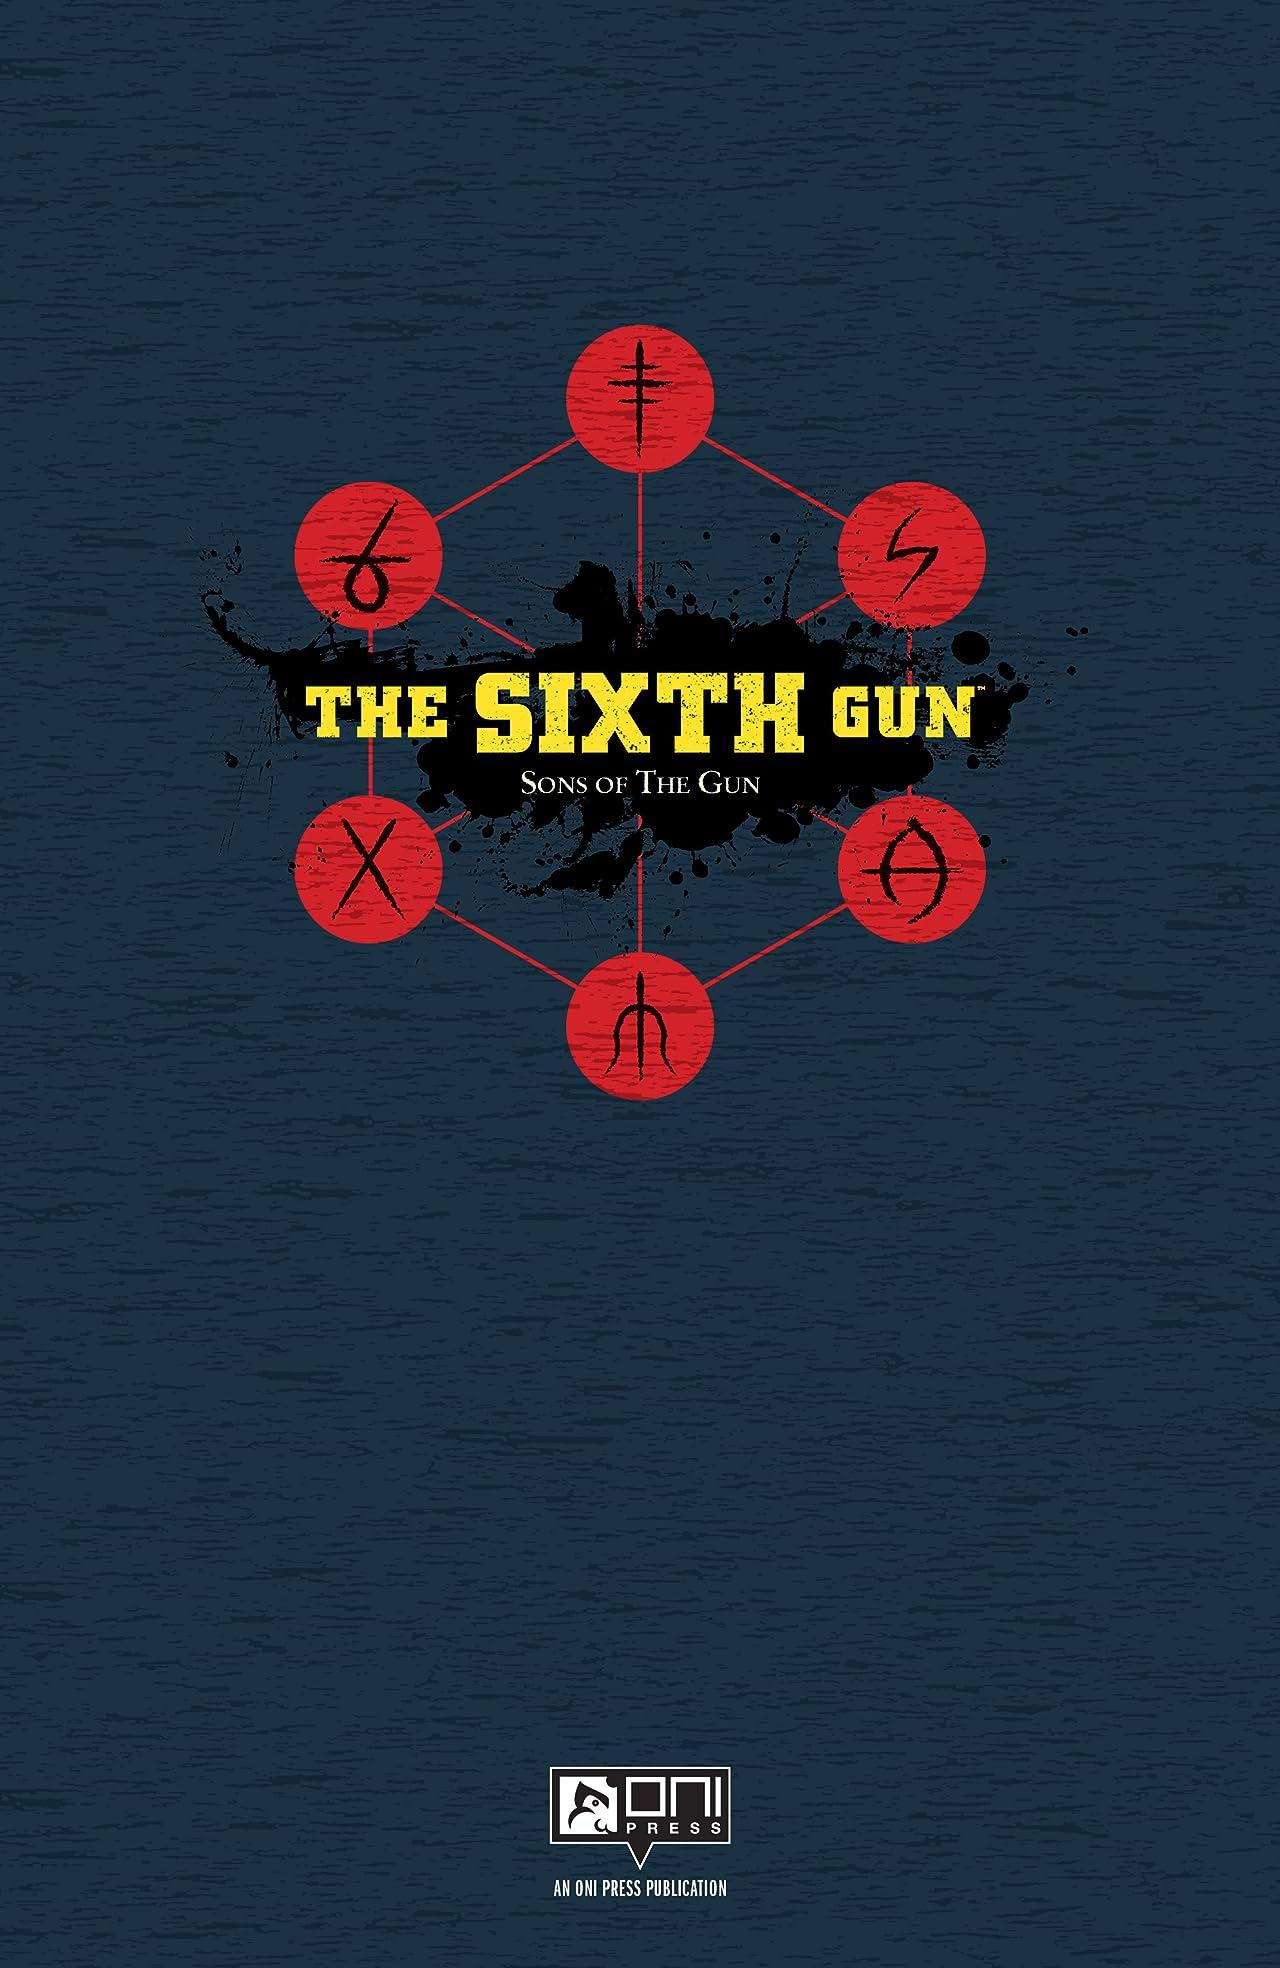 The Sixth Gun: Sons of the Gun